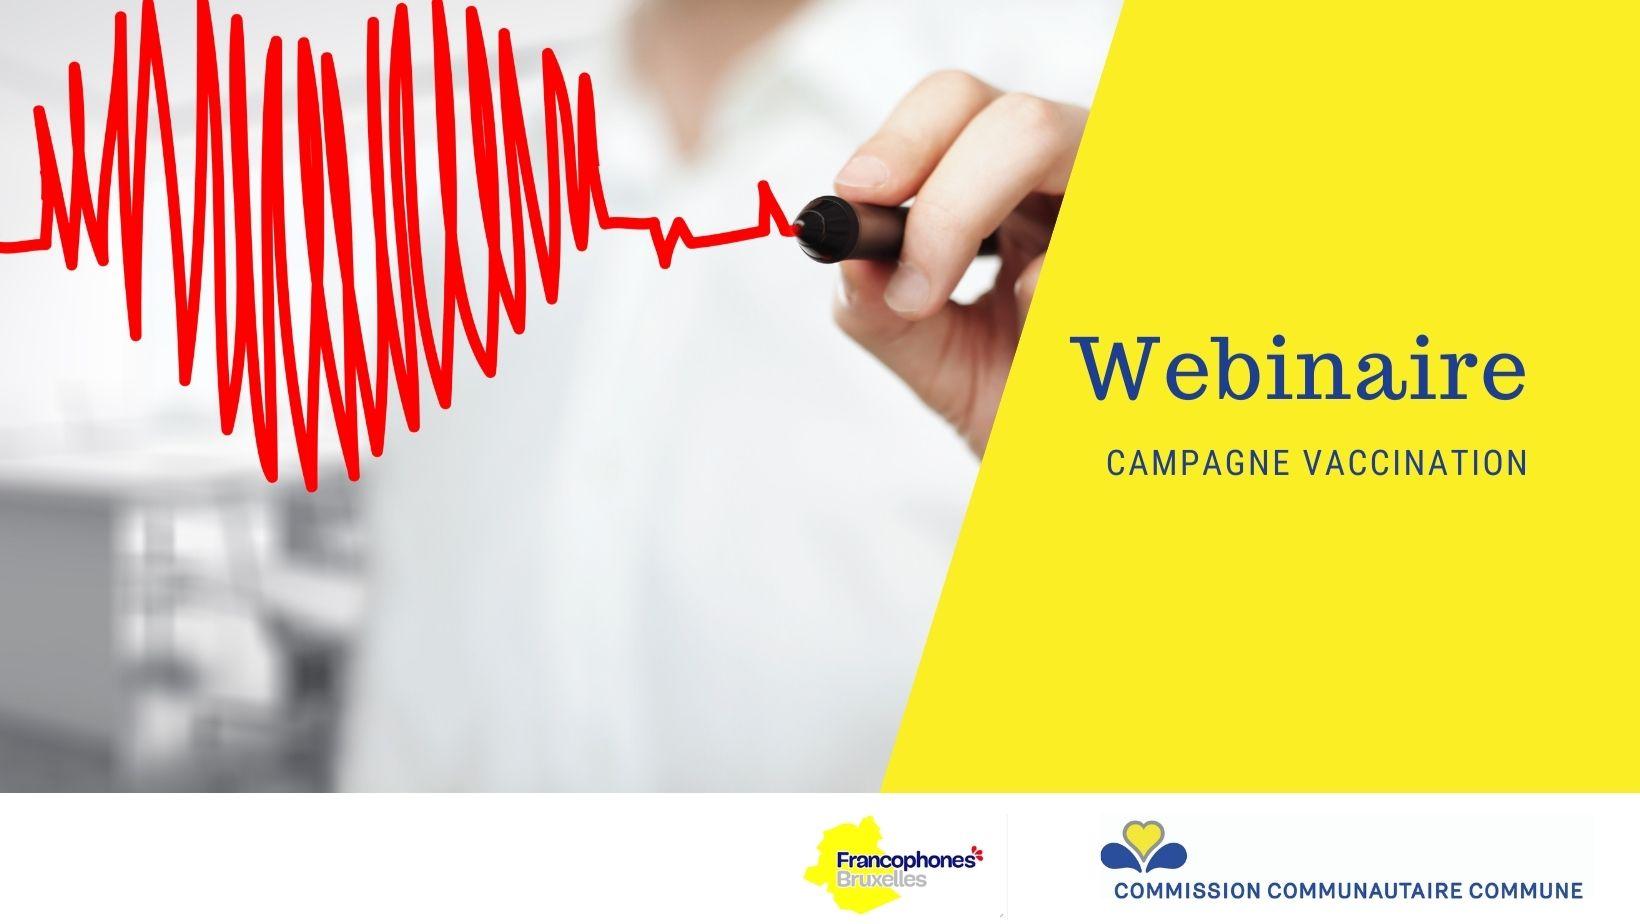 Webinaire campagne de vaccination